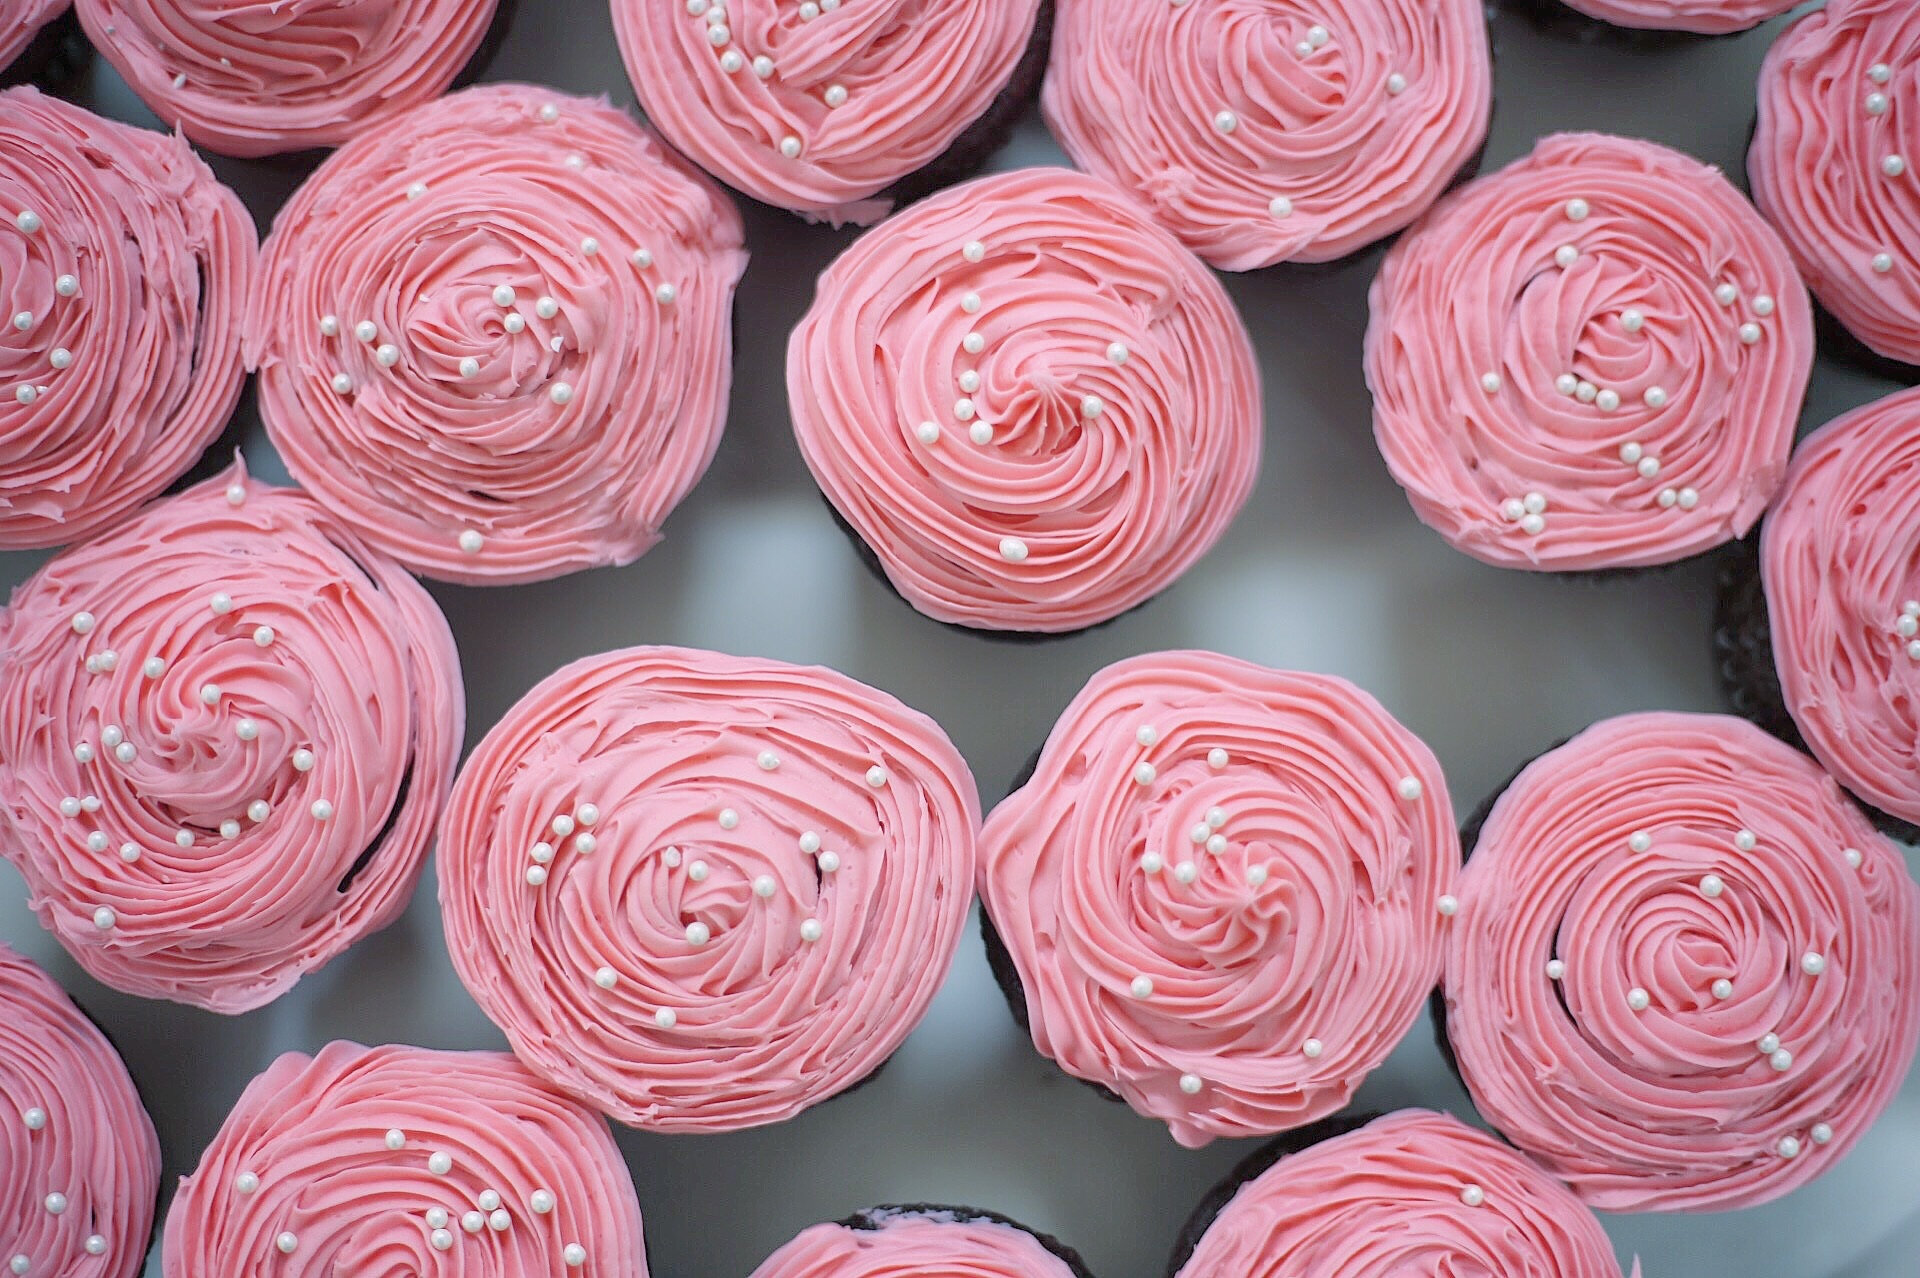 Canva - Cupcake Pastry Desserts.jpg